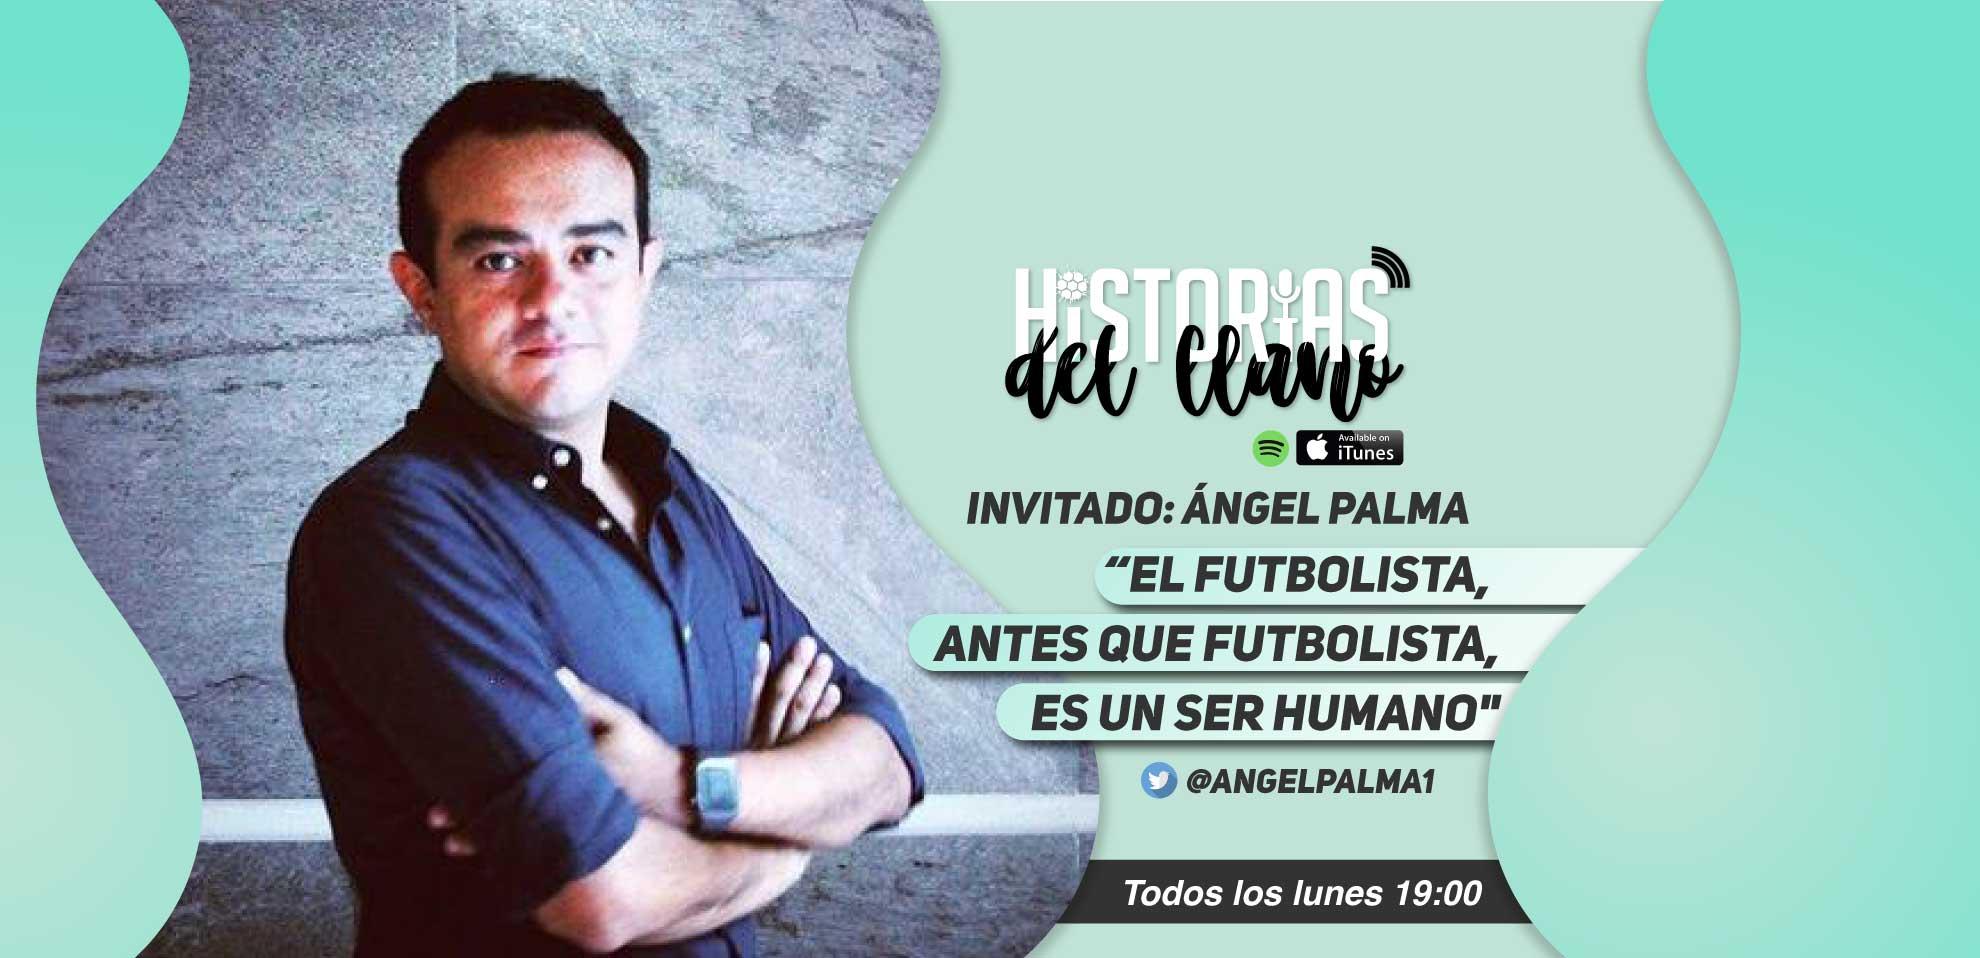 Ángel Palma